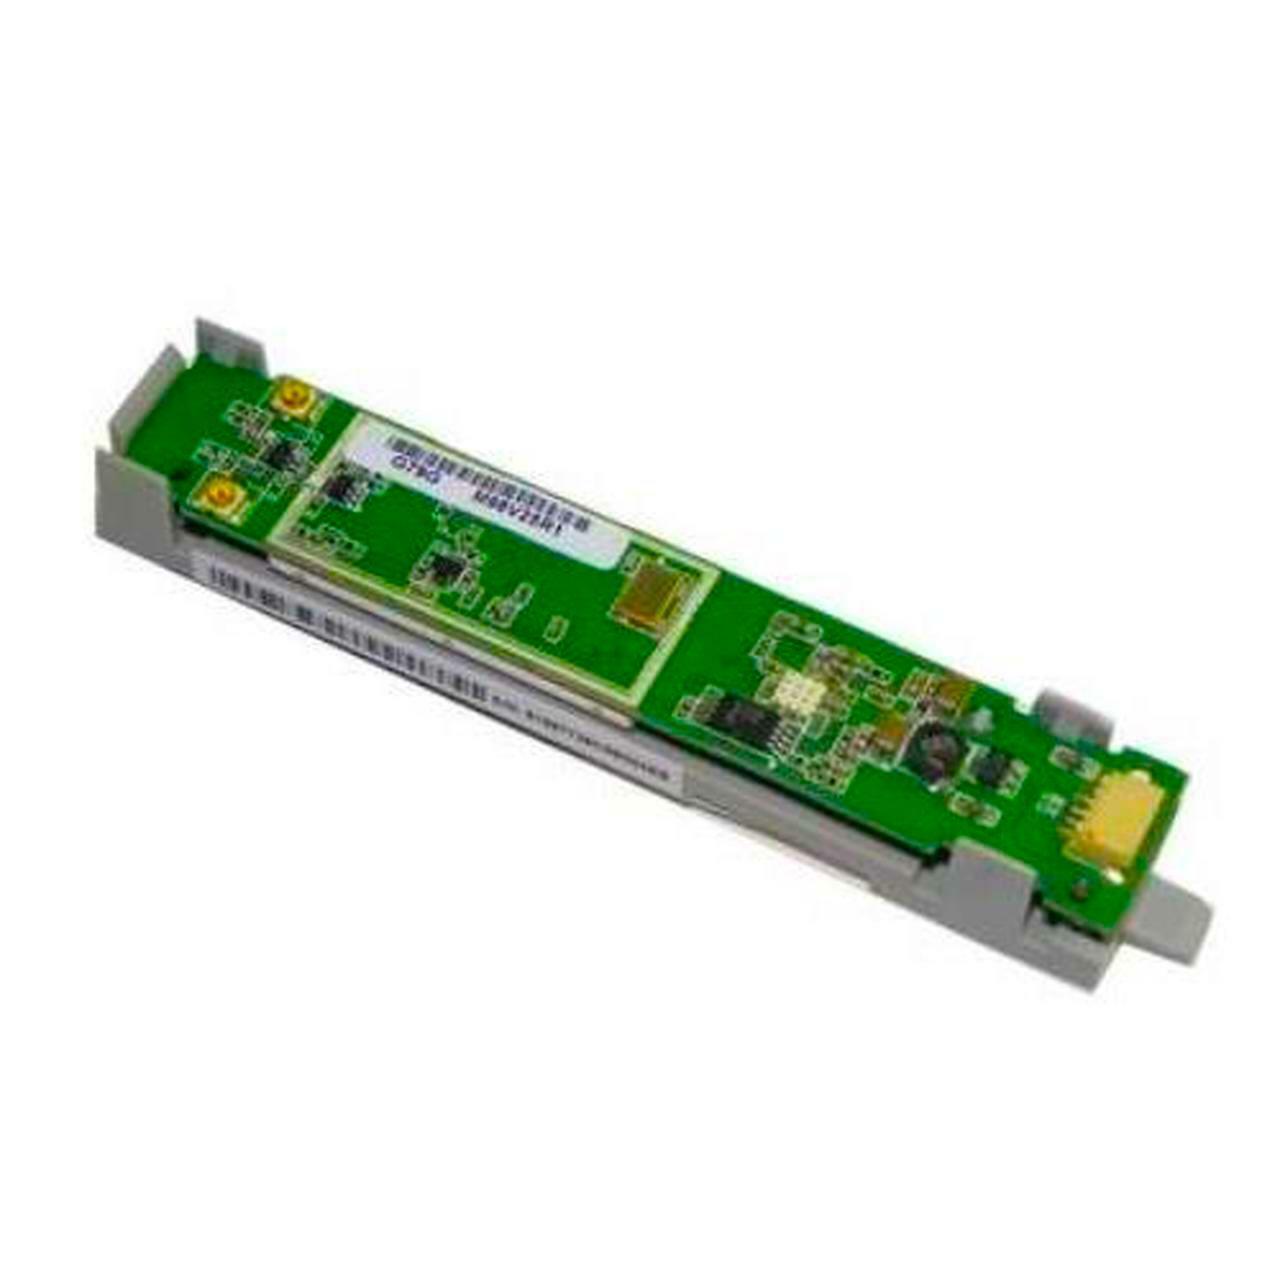 5188-7736 I HP - 802.11 B-G Wireless Board WLAN